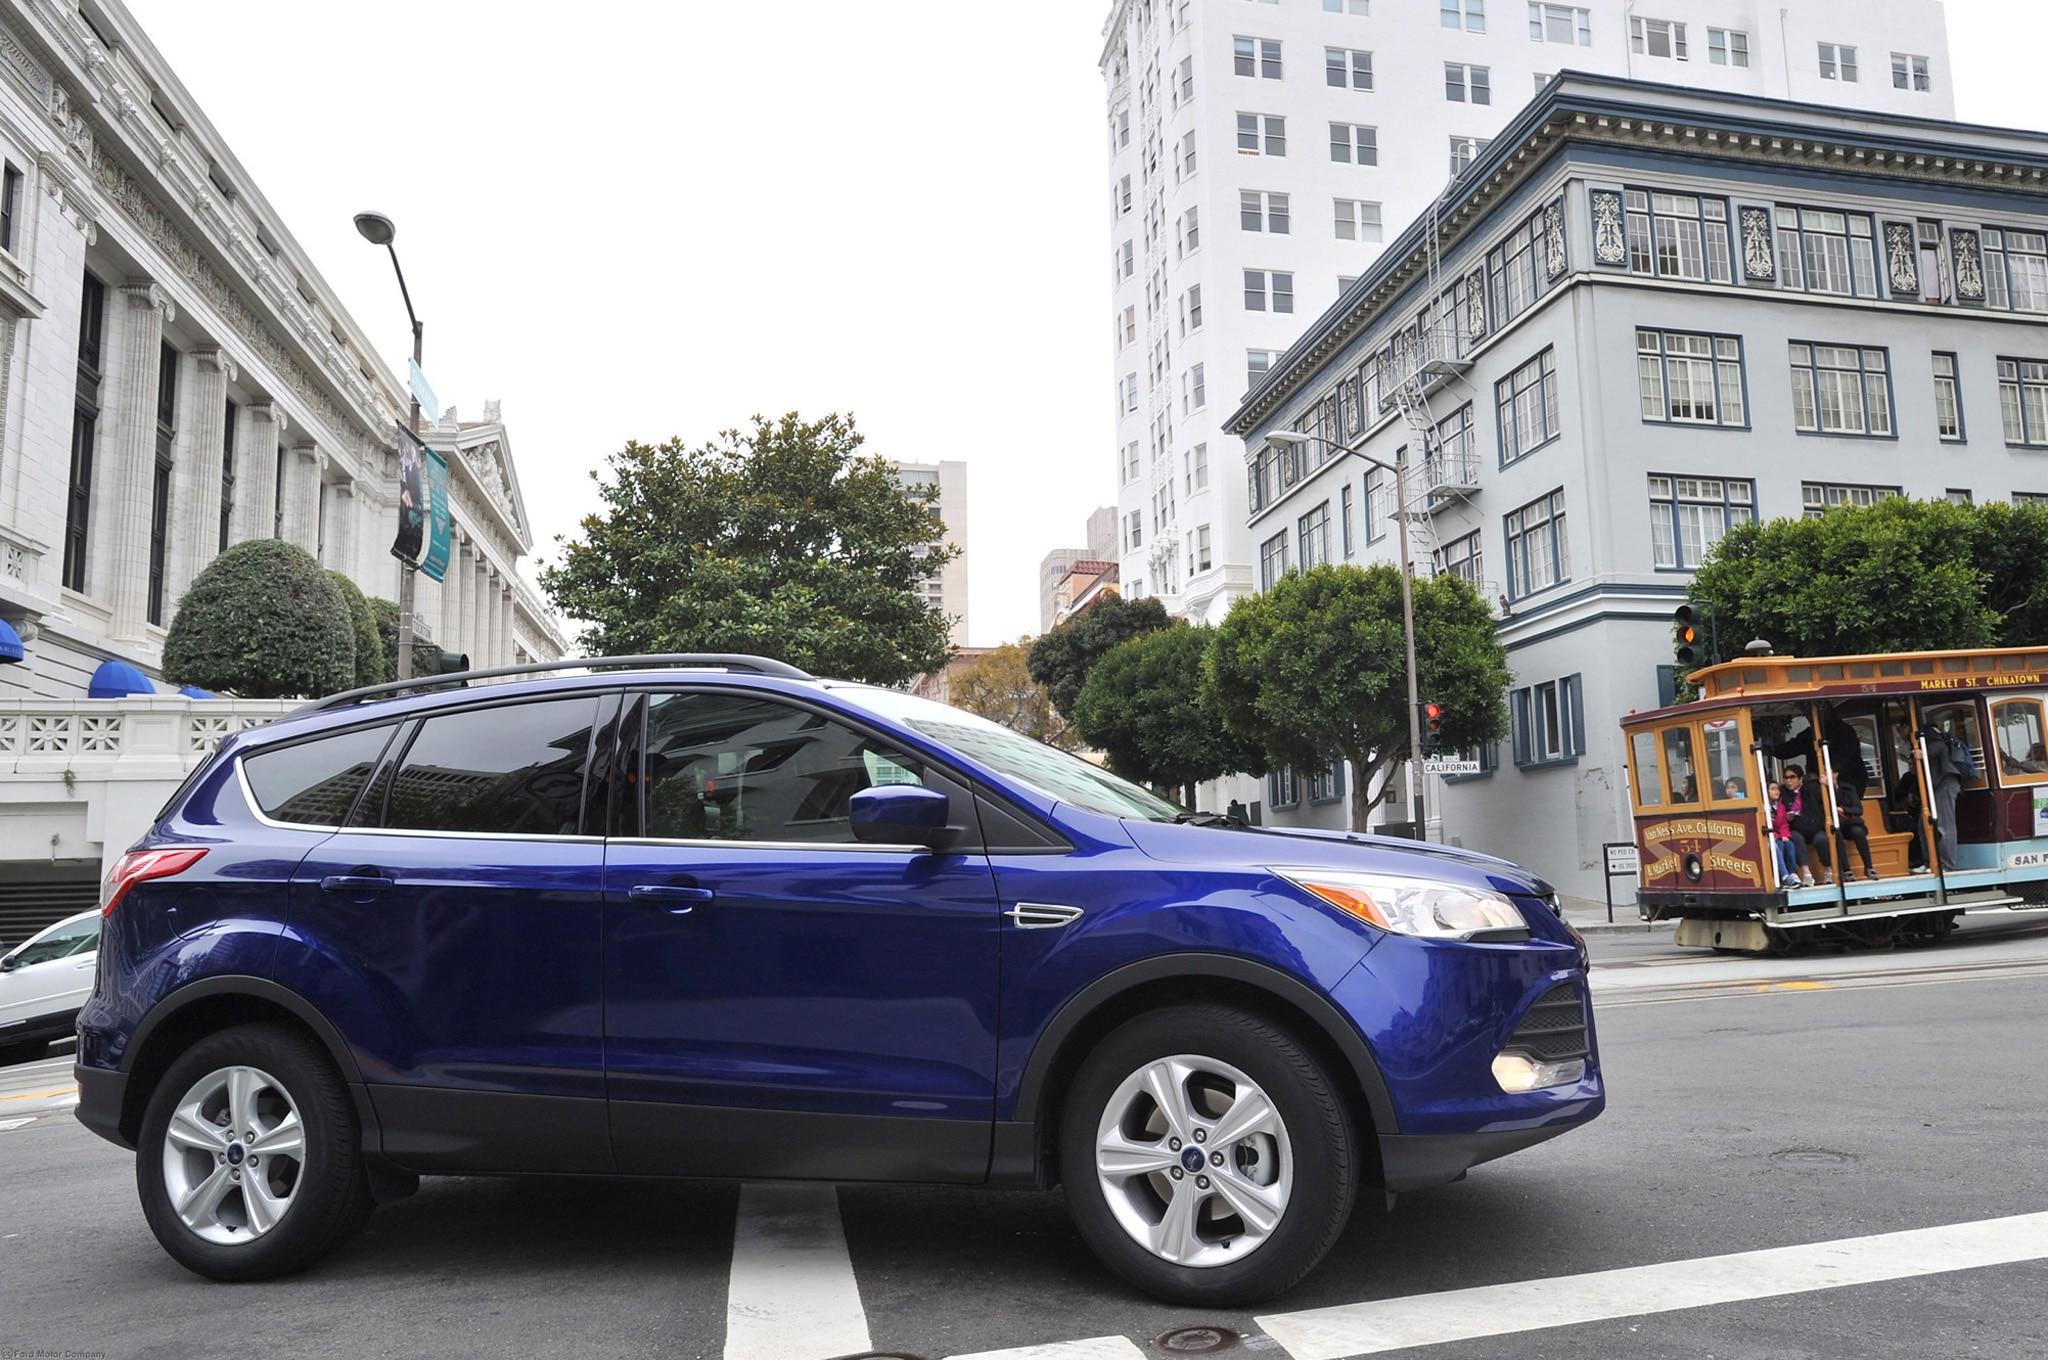 2013 Ford Escape Side Profile In Motion 21